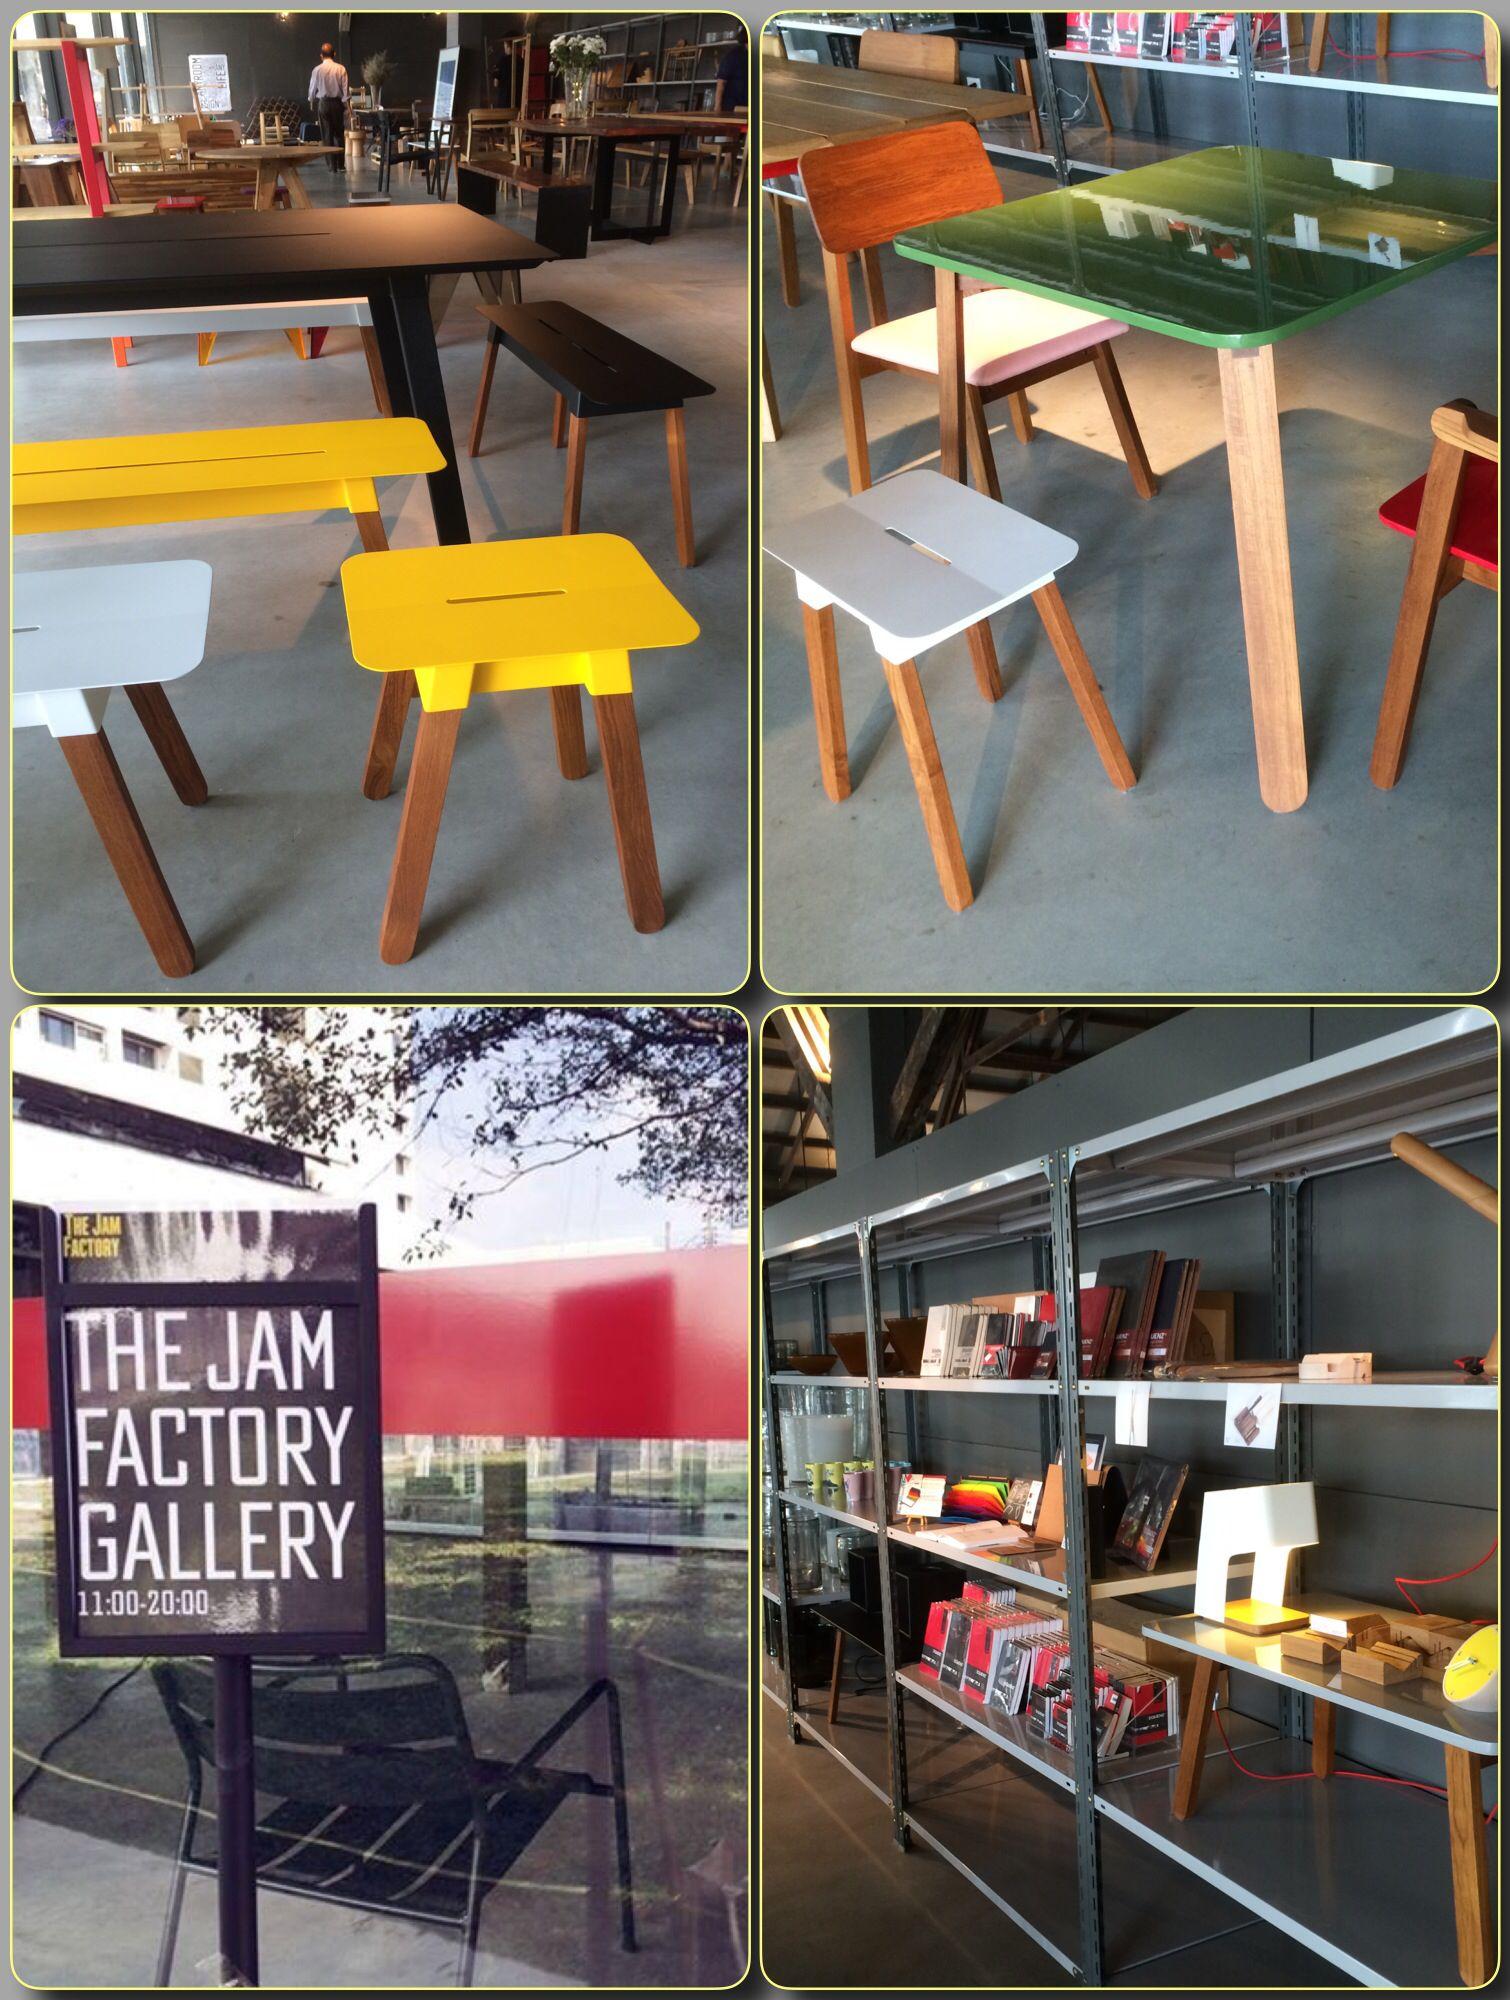 The Jam Factory Gallery No.8